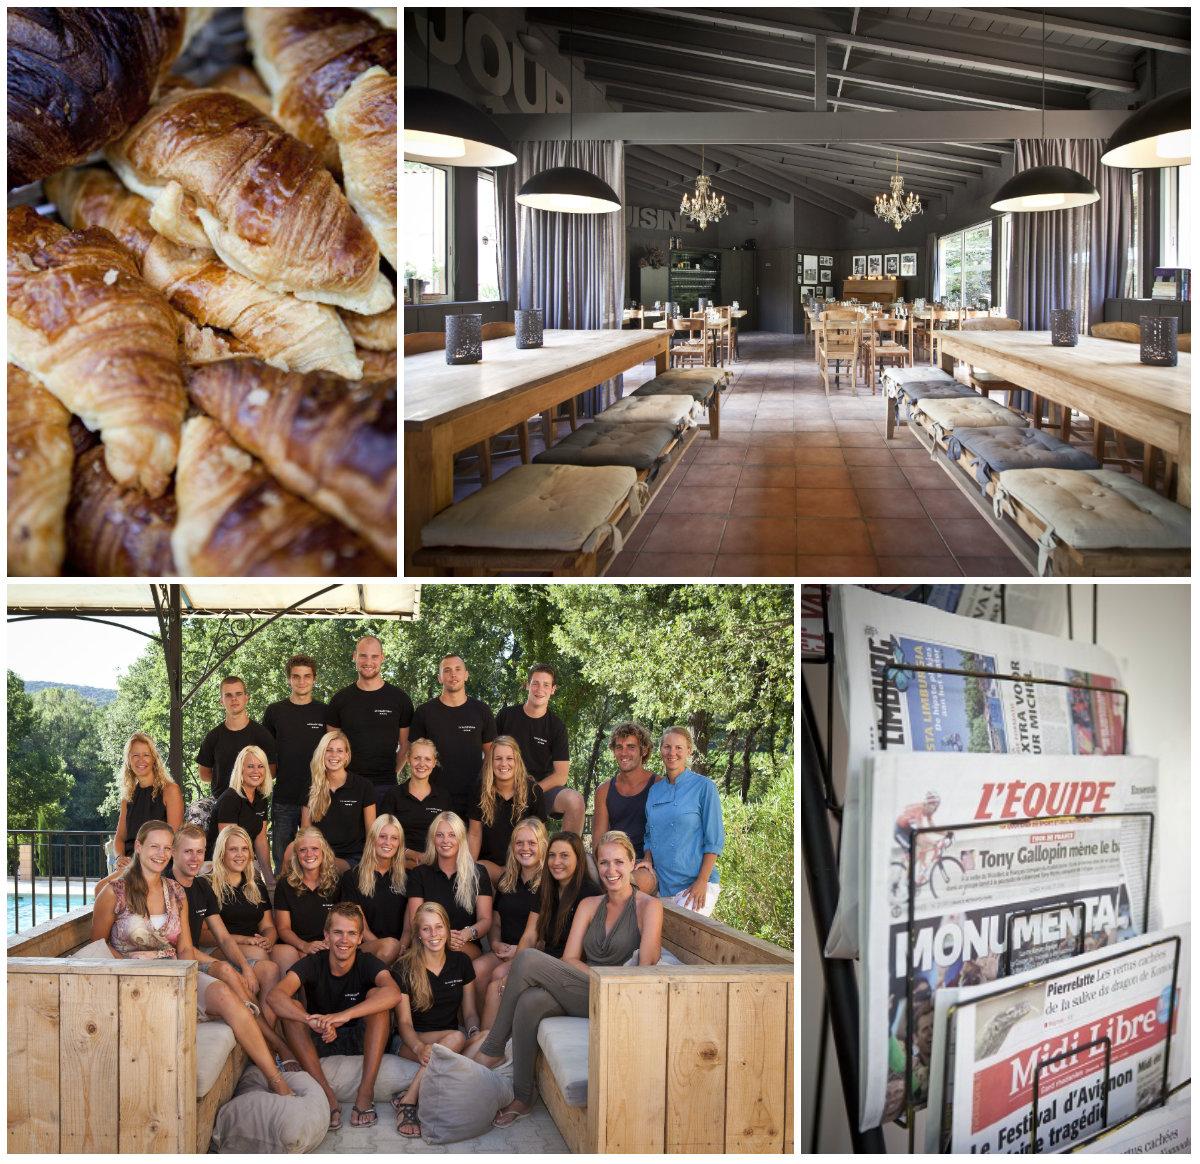 Nederlandse camping Languedoc aan riviertje team